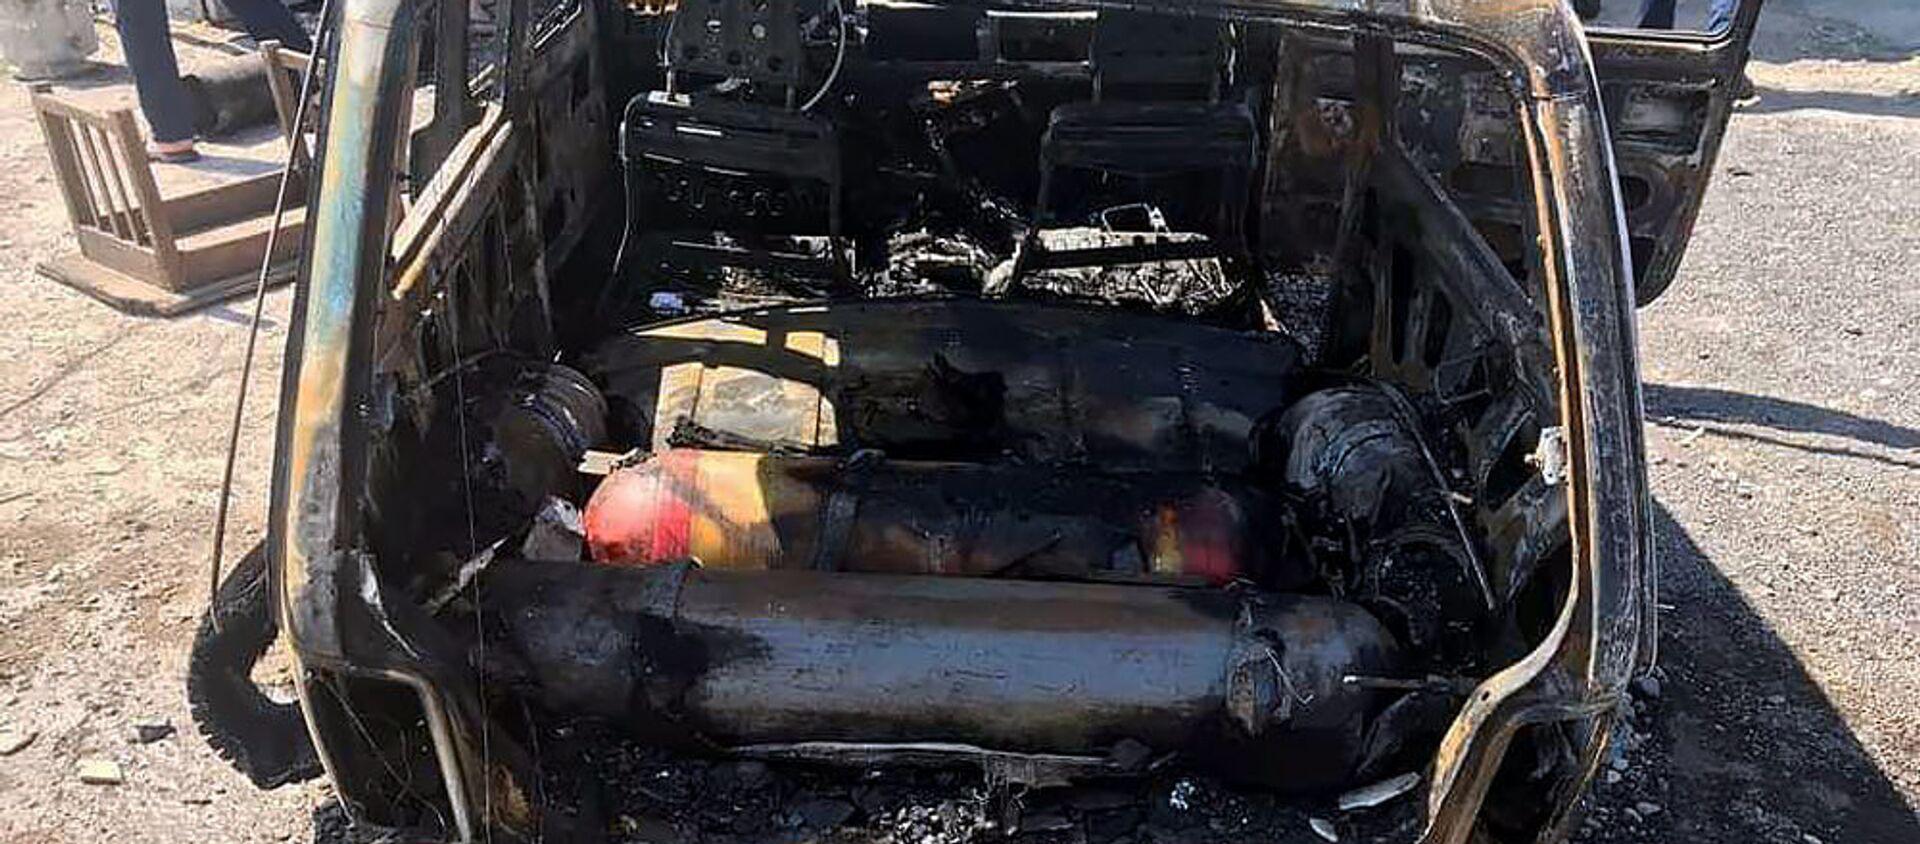 Сгоревший автомобиль ВАЗ 2121 (9 июля 2019). Арташат - Sputnik Արմենիա, 1920, 18.06.2021